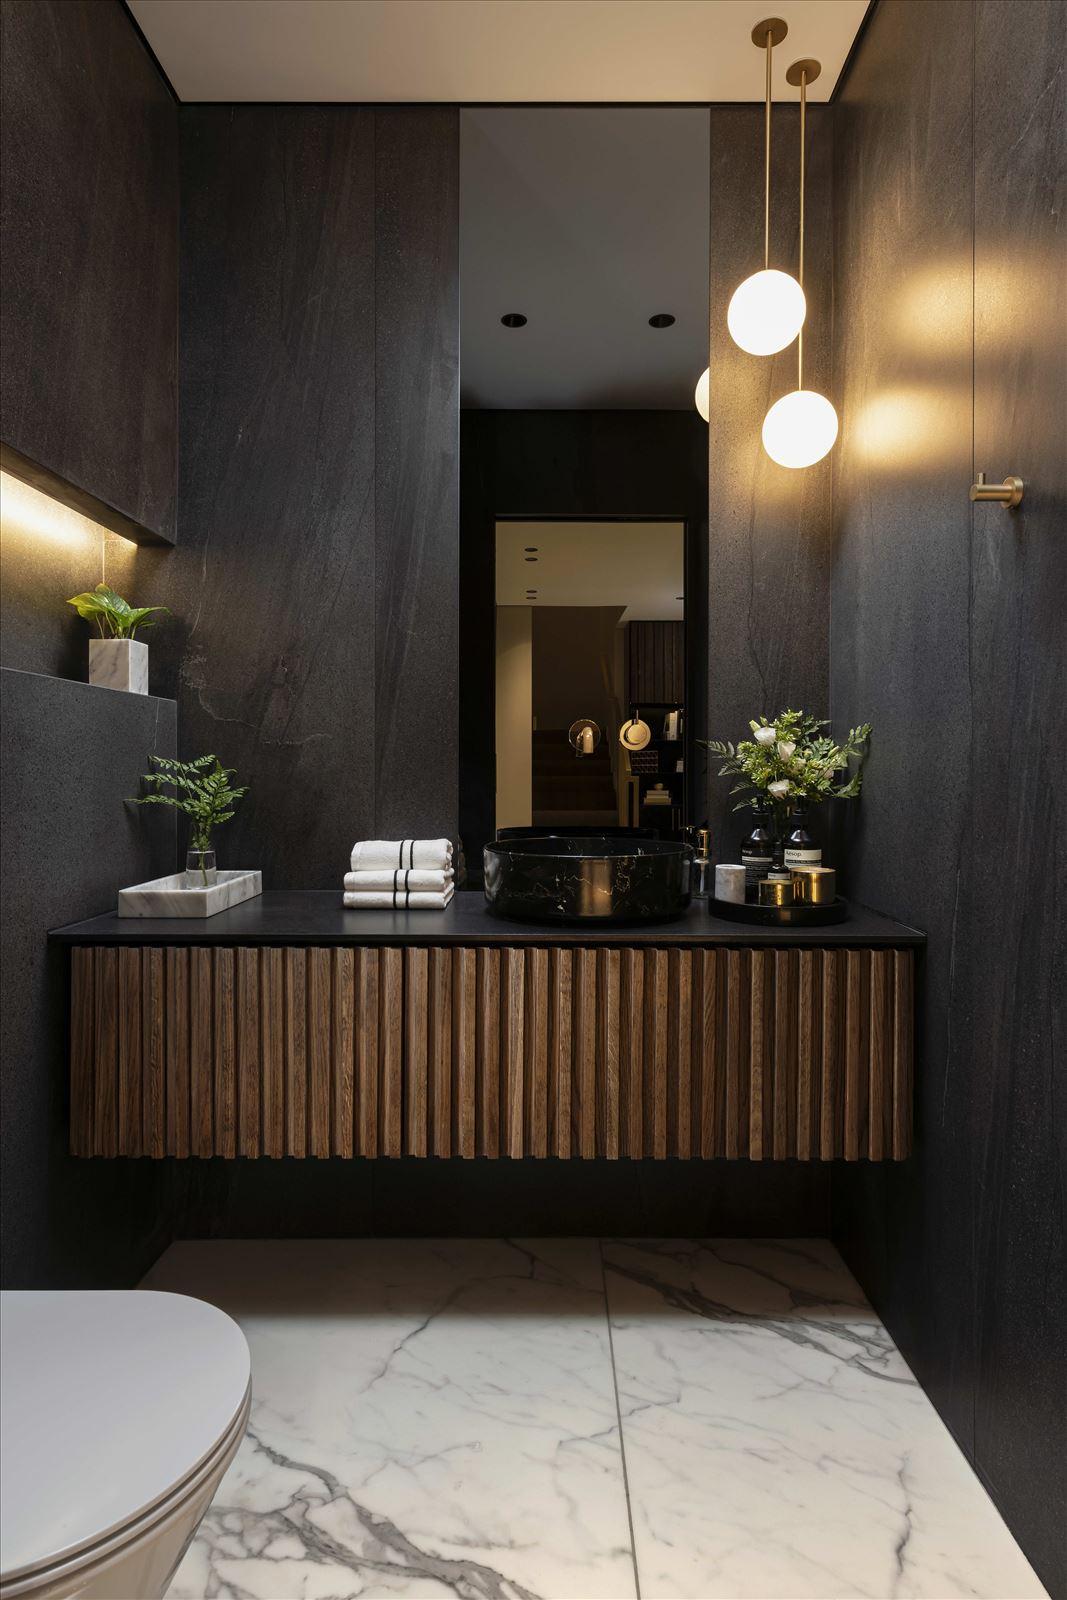 HOUSE Between The Mountains תאורה תלויה בשירותים מבית קמחי תאורה